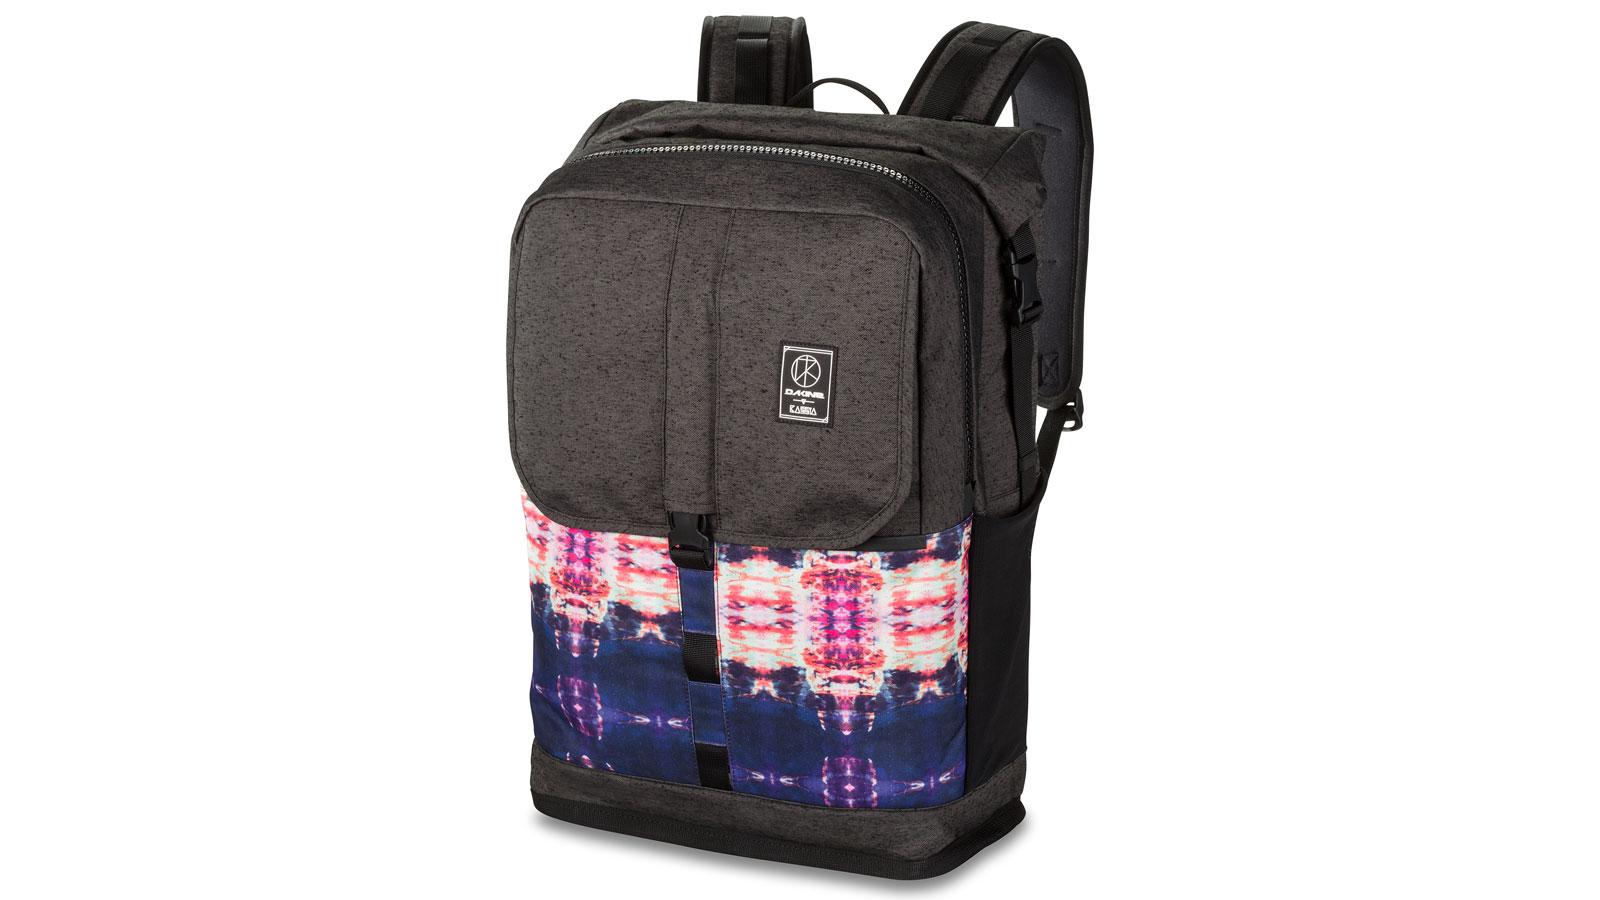 8aa4a5656791 Dakine SS19 Backpacks Preview - Boardsport SOURCE